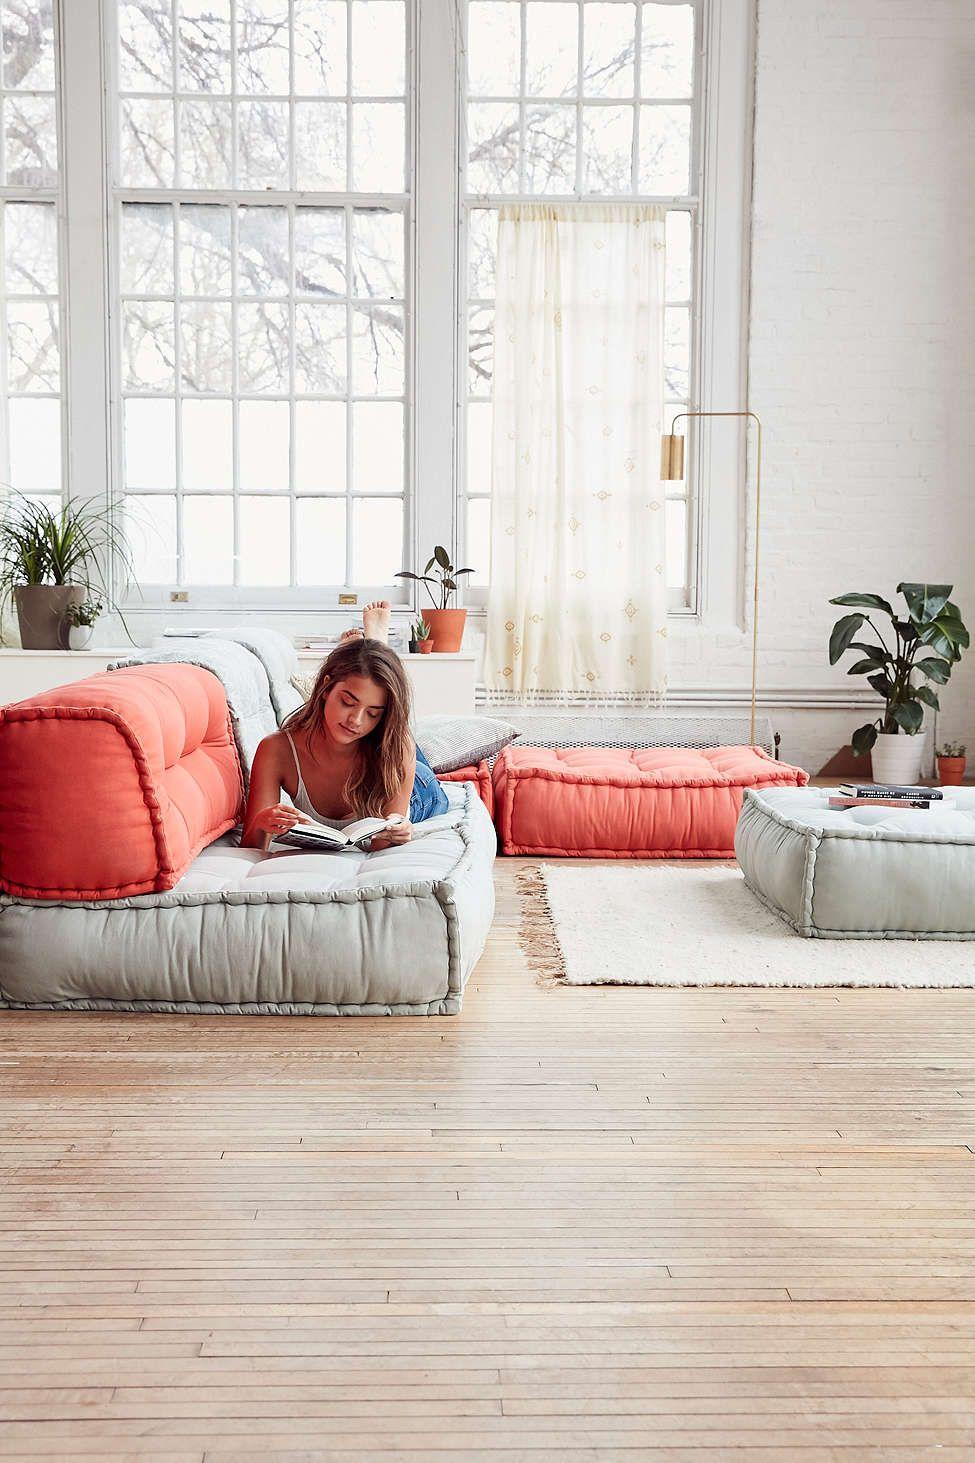 Pin By Three Pretty Beans On Artesanatos In 2020 Floor Cushions